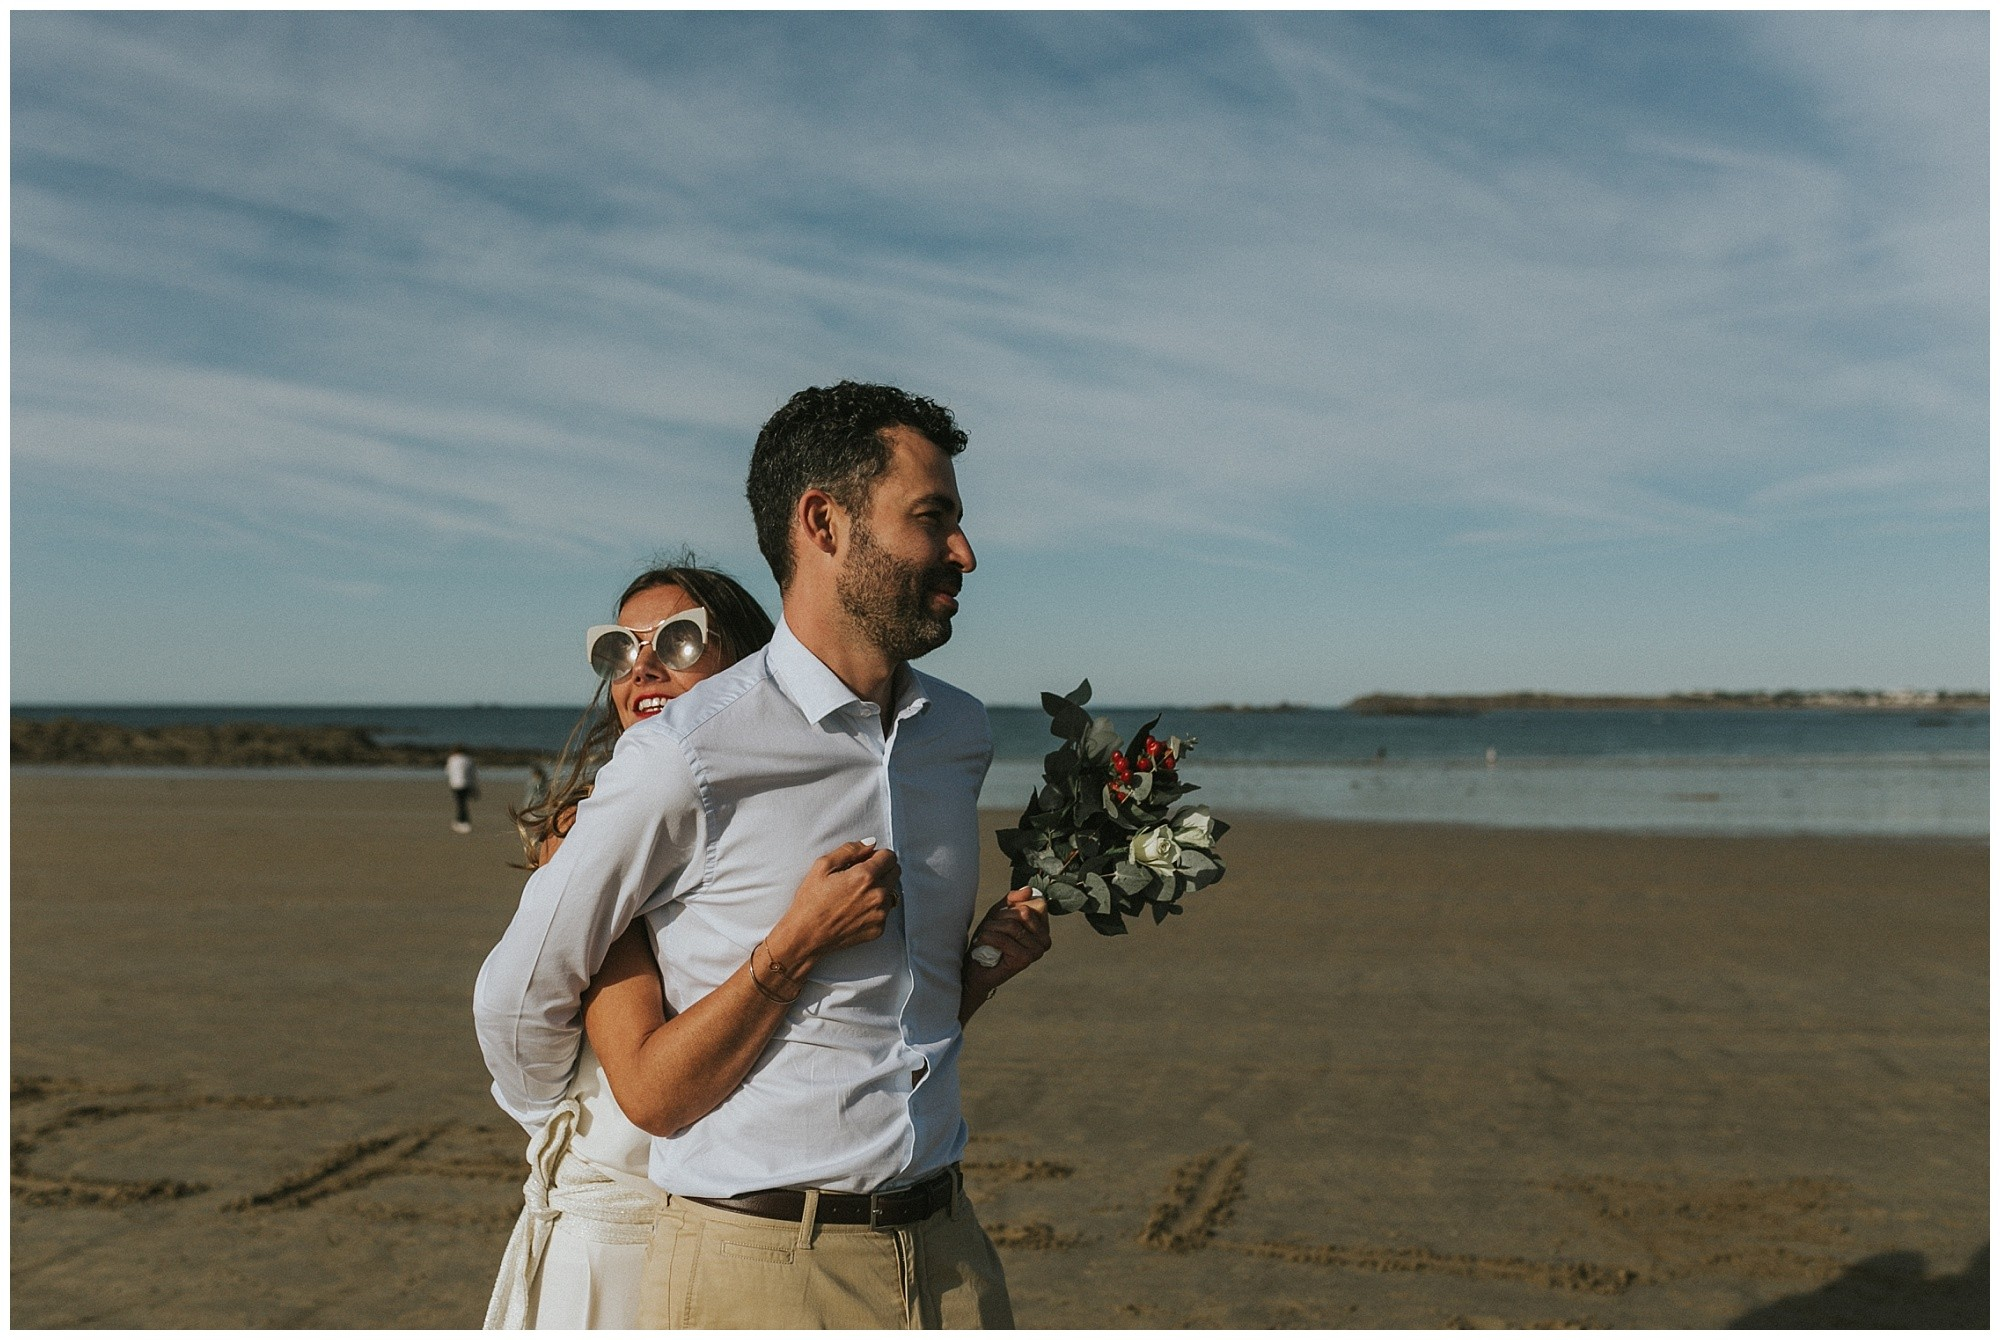 Kateryna-photos-photographe-mariage-bretagne-saint-malo-finistere-cotes-darmor-wedding_0060.jpg